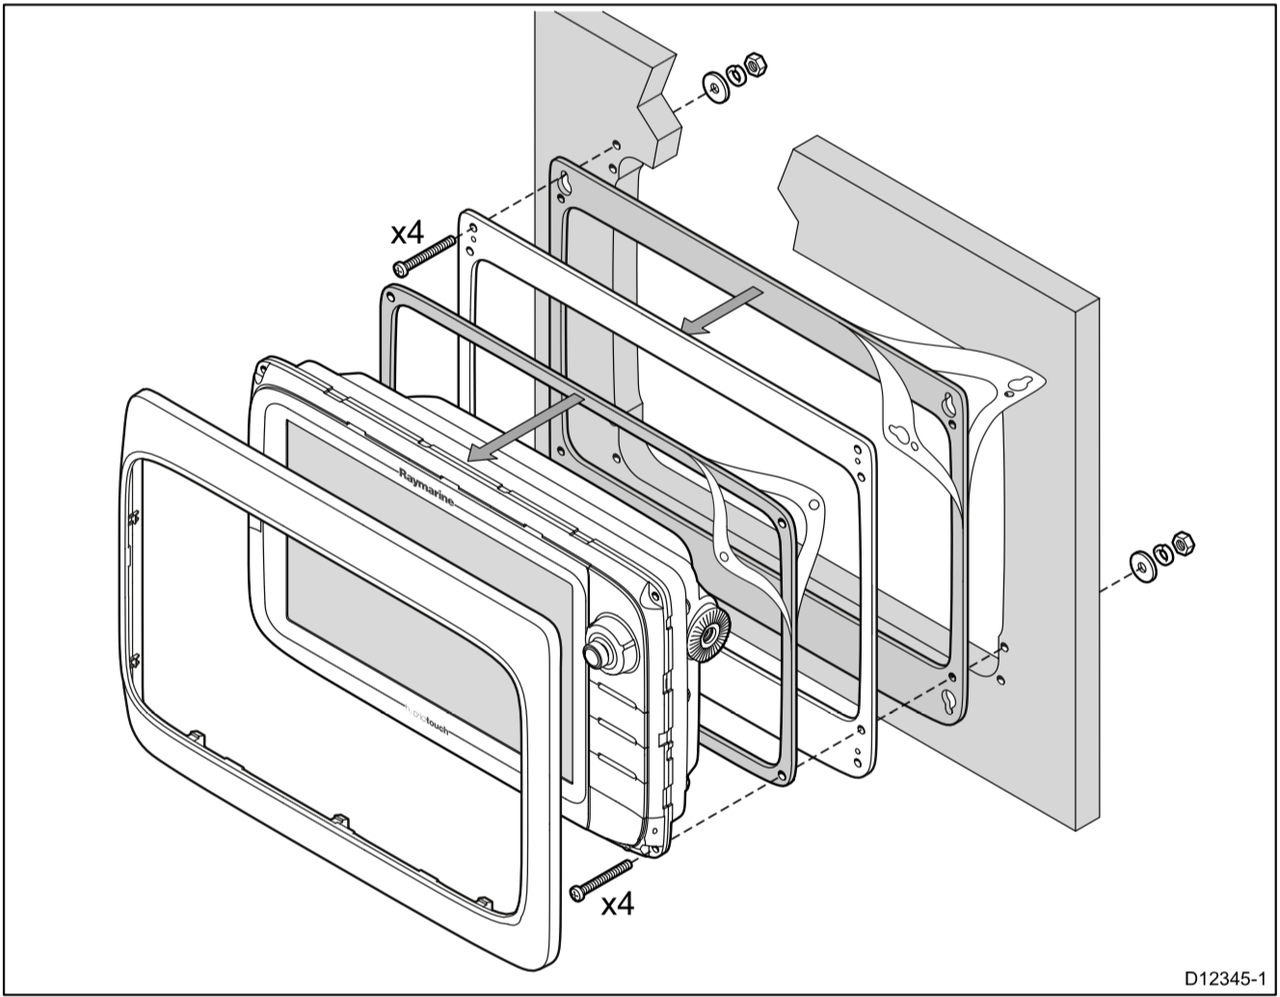 441s garmin wiring diagram wiring diagram h8 q see wiring diagram 441s garmin wiring diagram [ 1280 x 997 Pixel ]